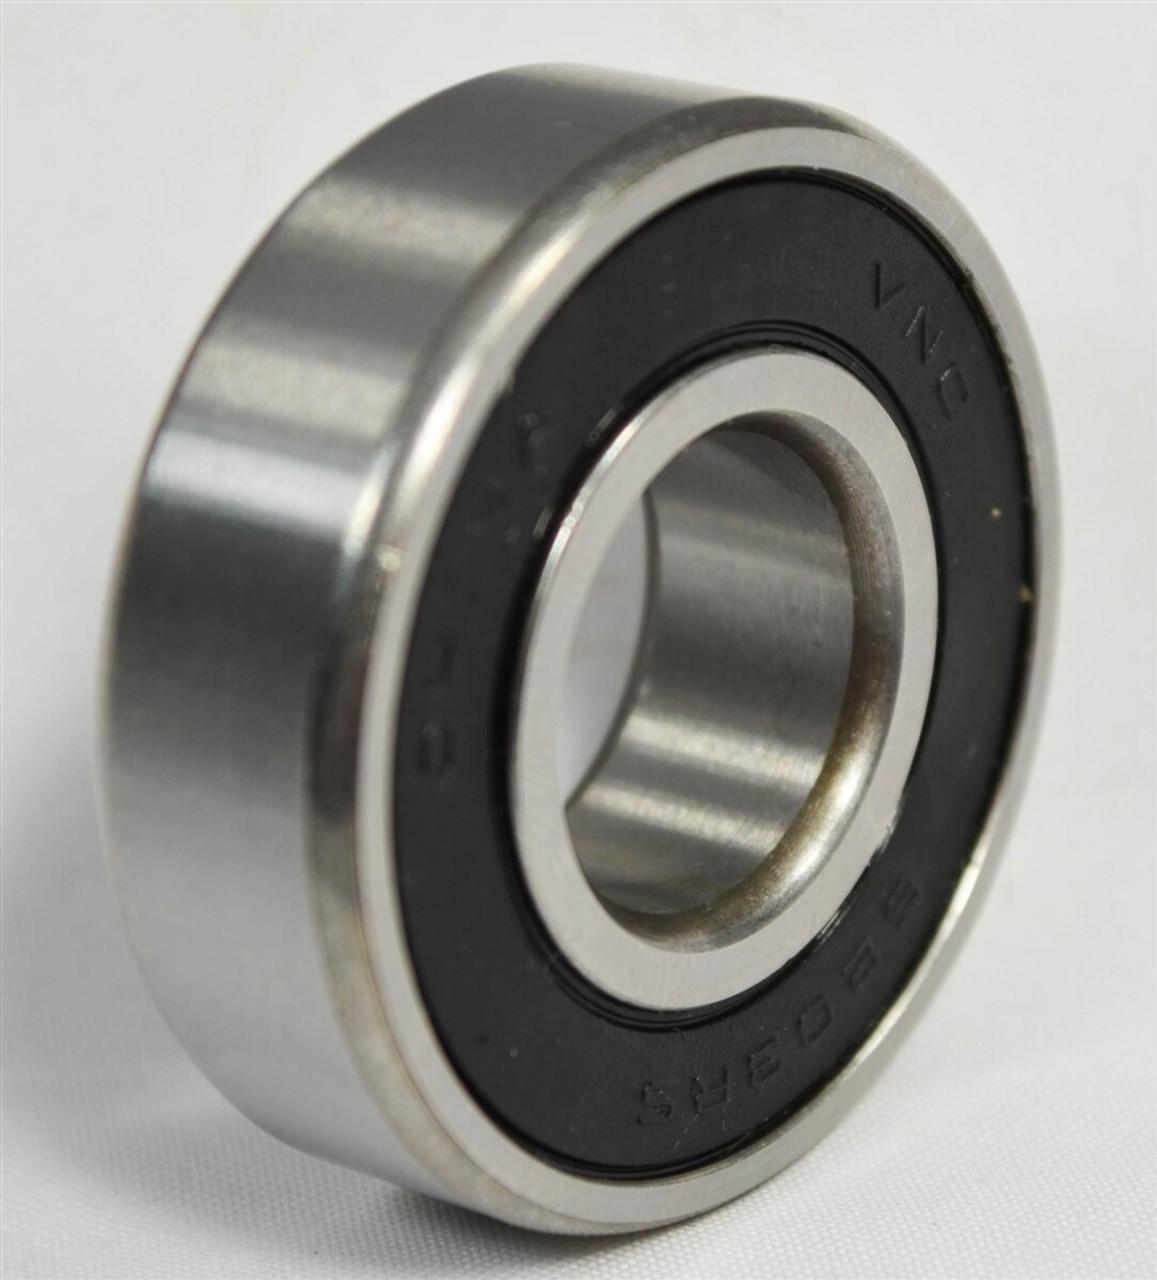 6005-2RS  25mm Bore - Rubber Seals (Qty 10)